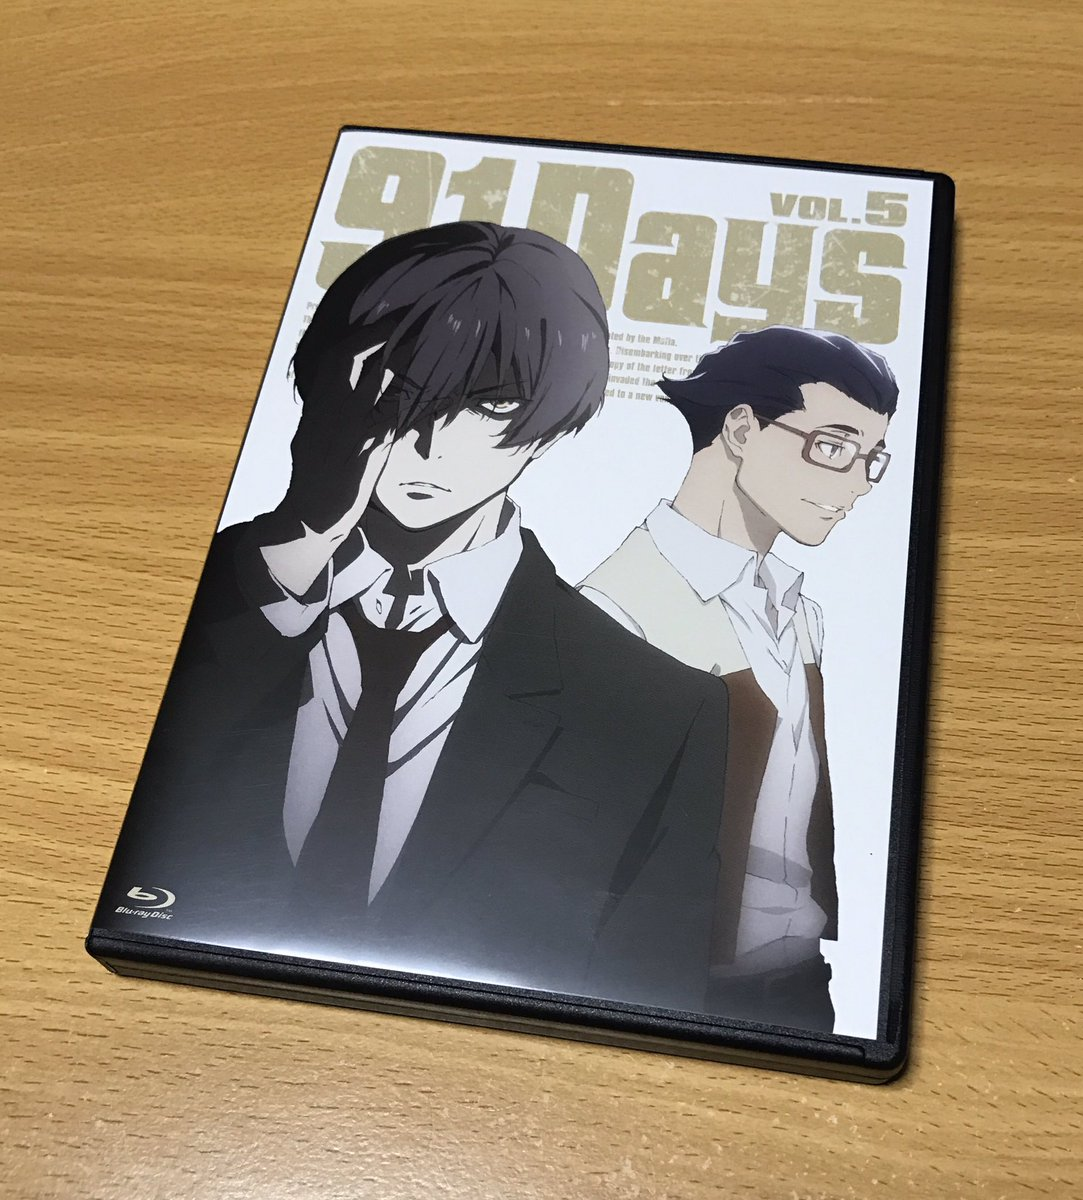 『91Days』Blu-ray第5巻が届きましたー!アヴィリオ、いい表情だ…#91Days